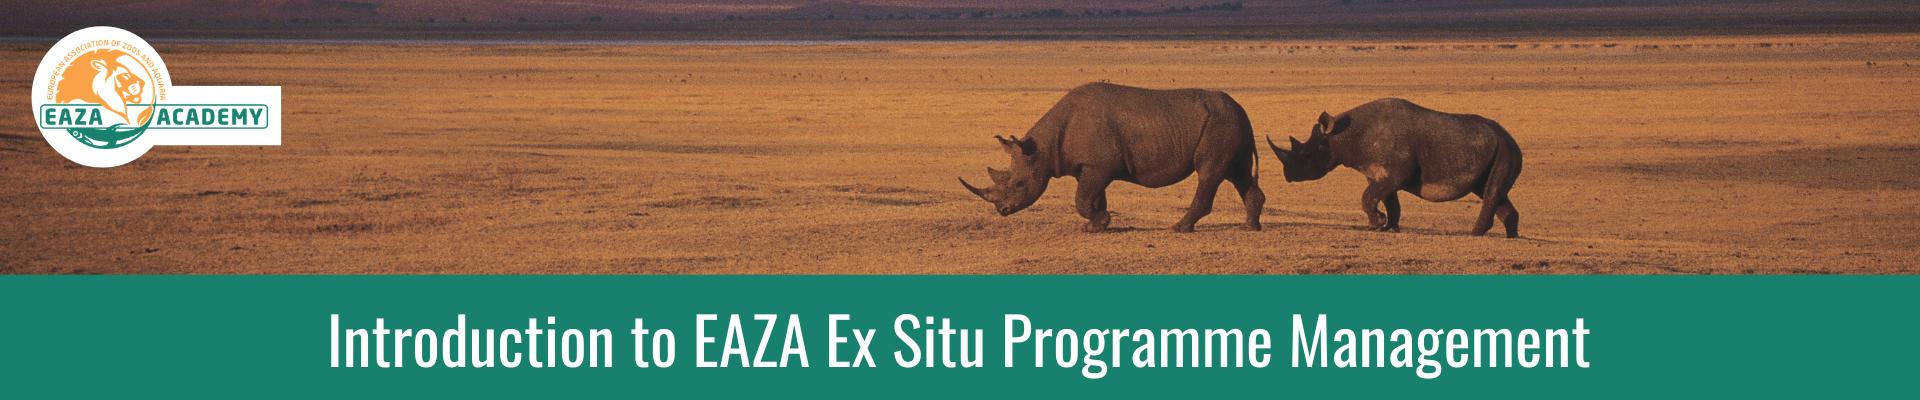 Introduction to EAZA Ex situ Programme Management